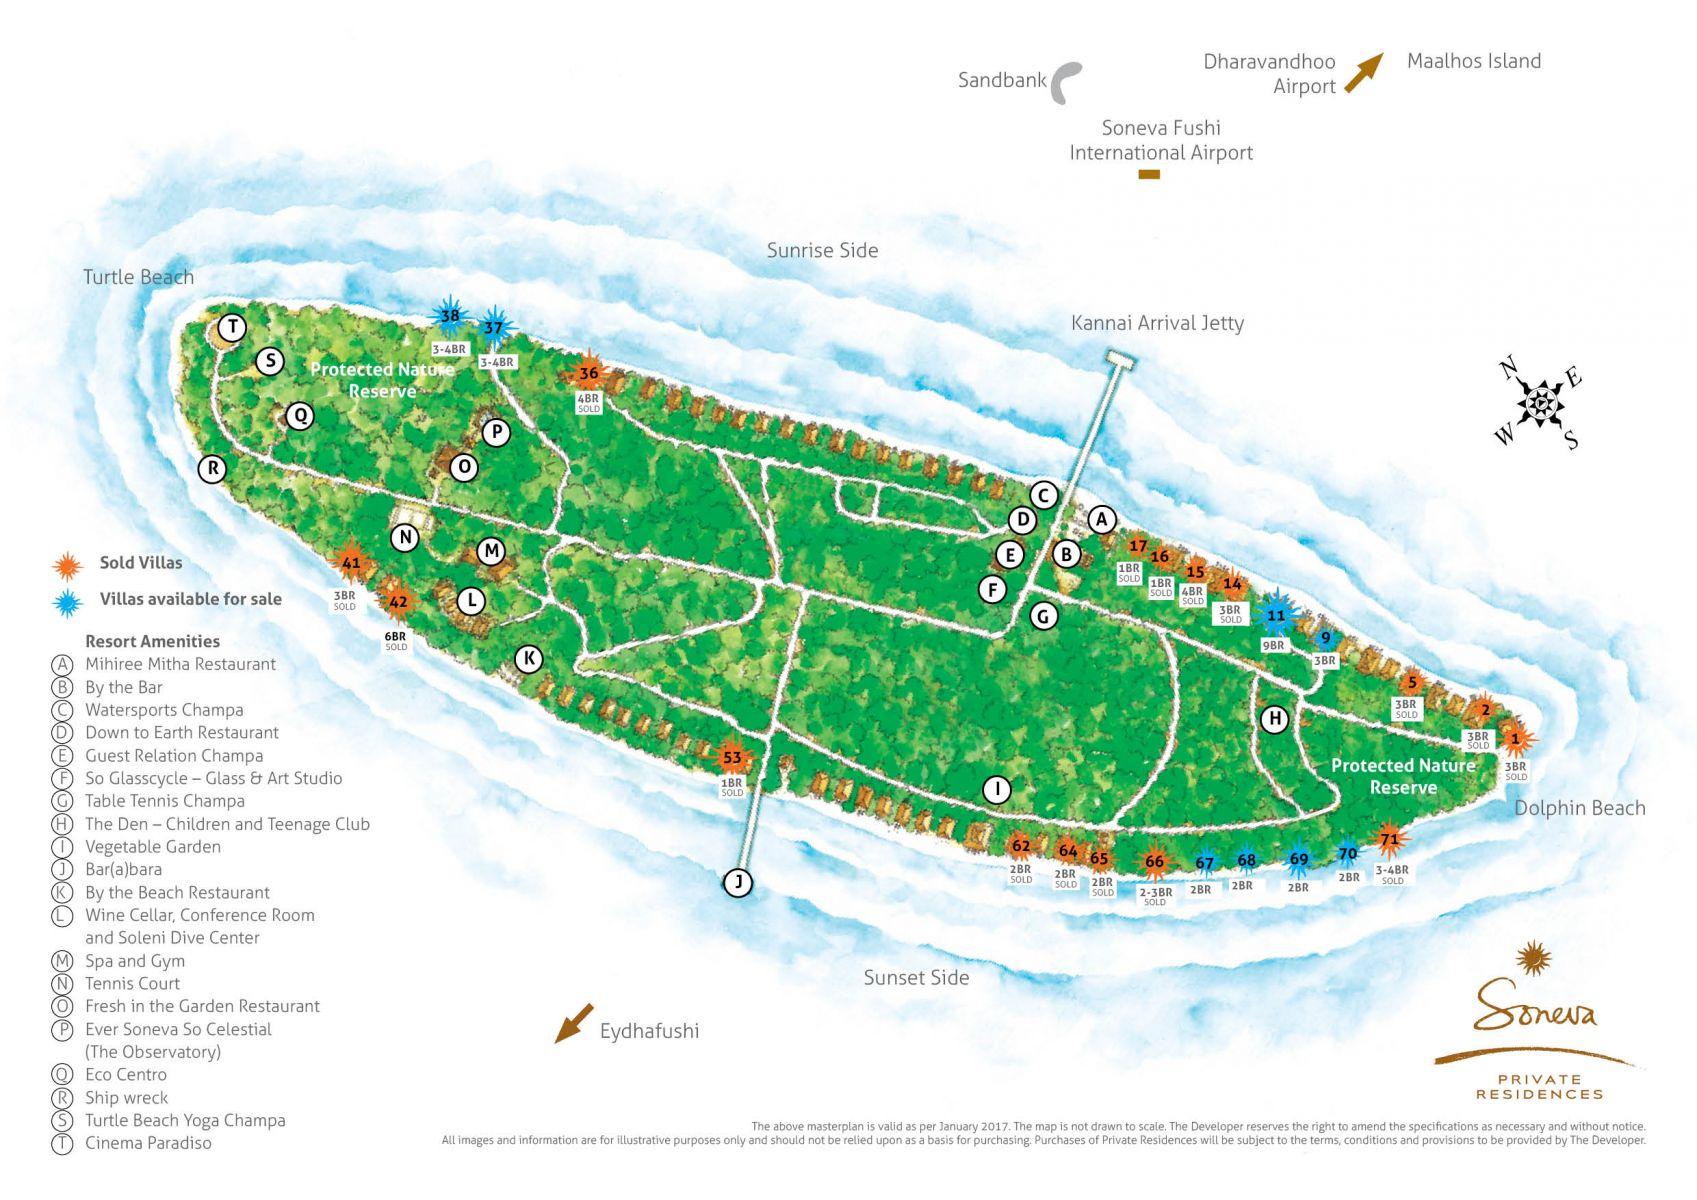 soneva-fushi-masterplan_jan17-residences